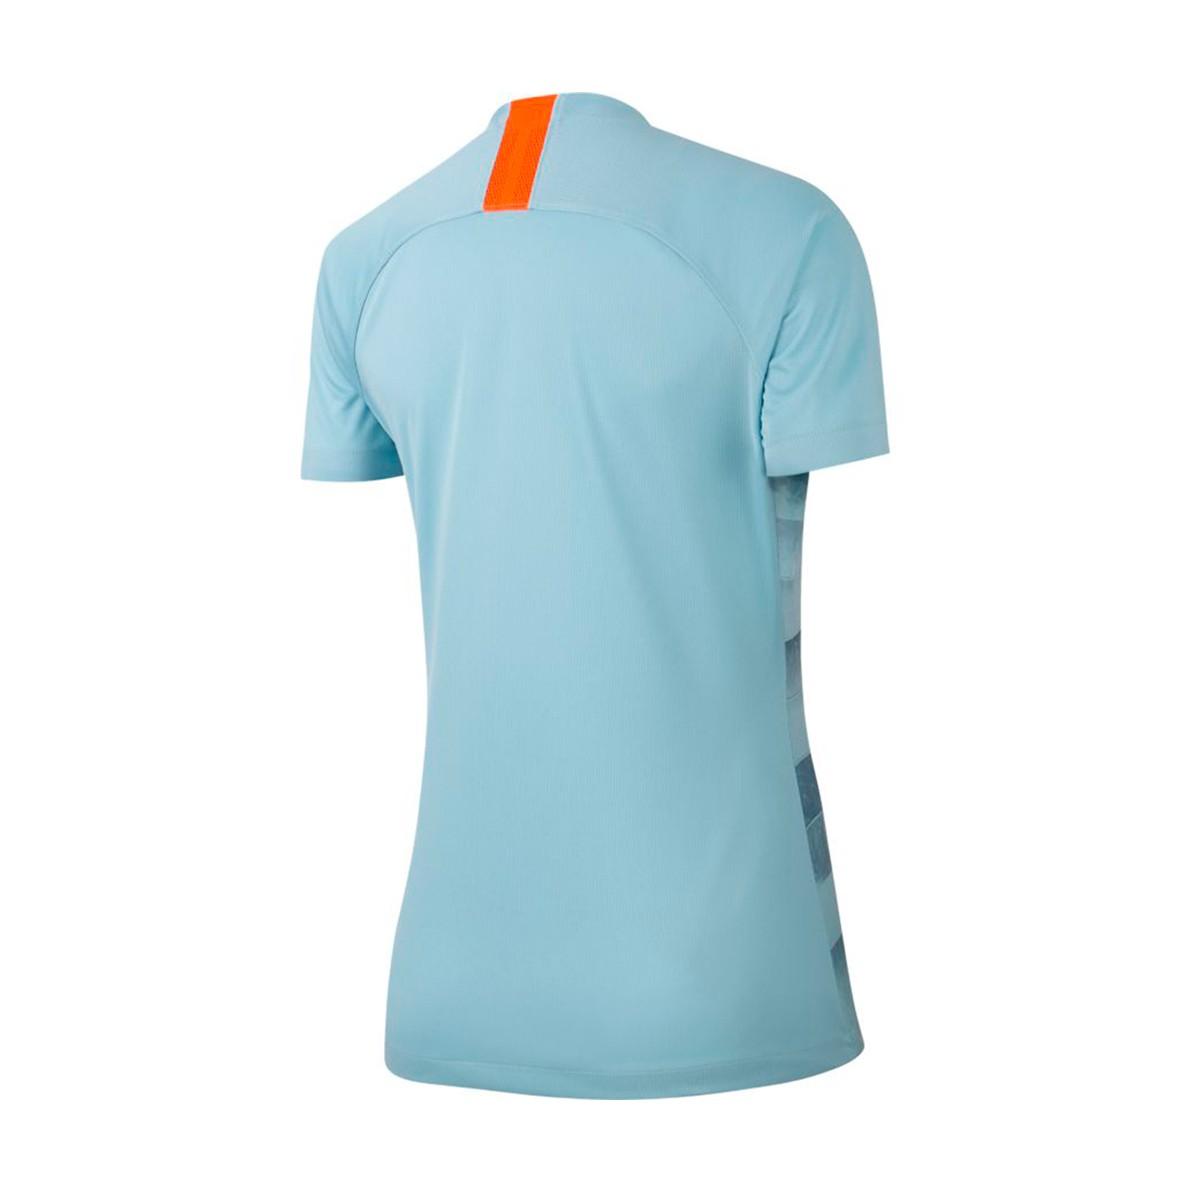 best cheap 212b7 2e345 Camiseta Chelsea FC Stadium Tercera Equipación 2018-2019 Mujer Ocean  bliss-Metallic silver